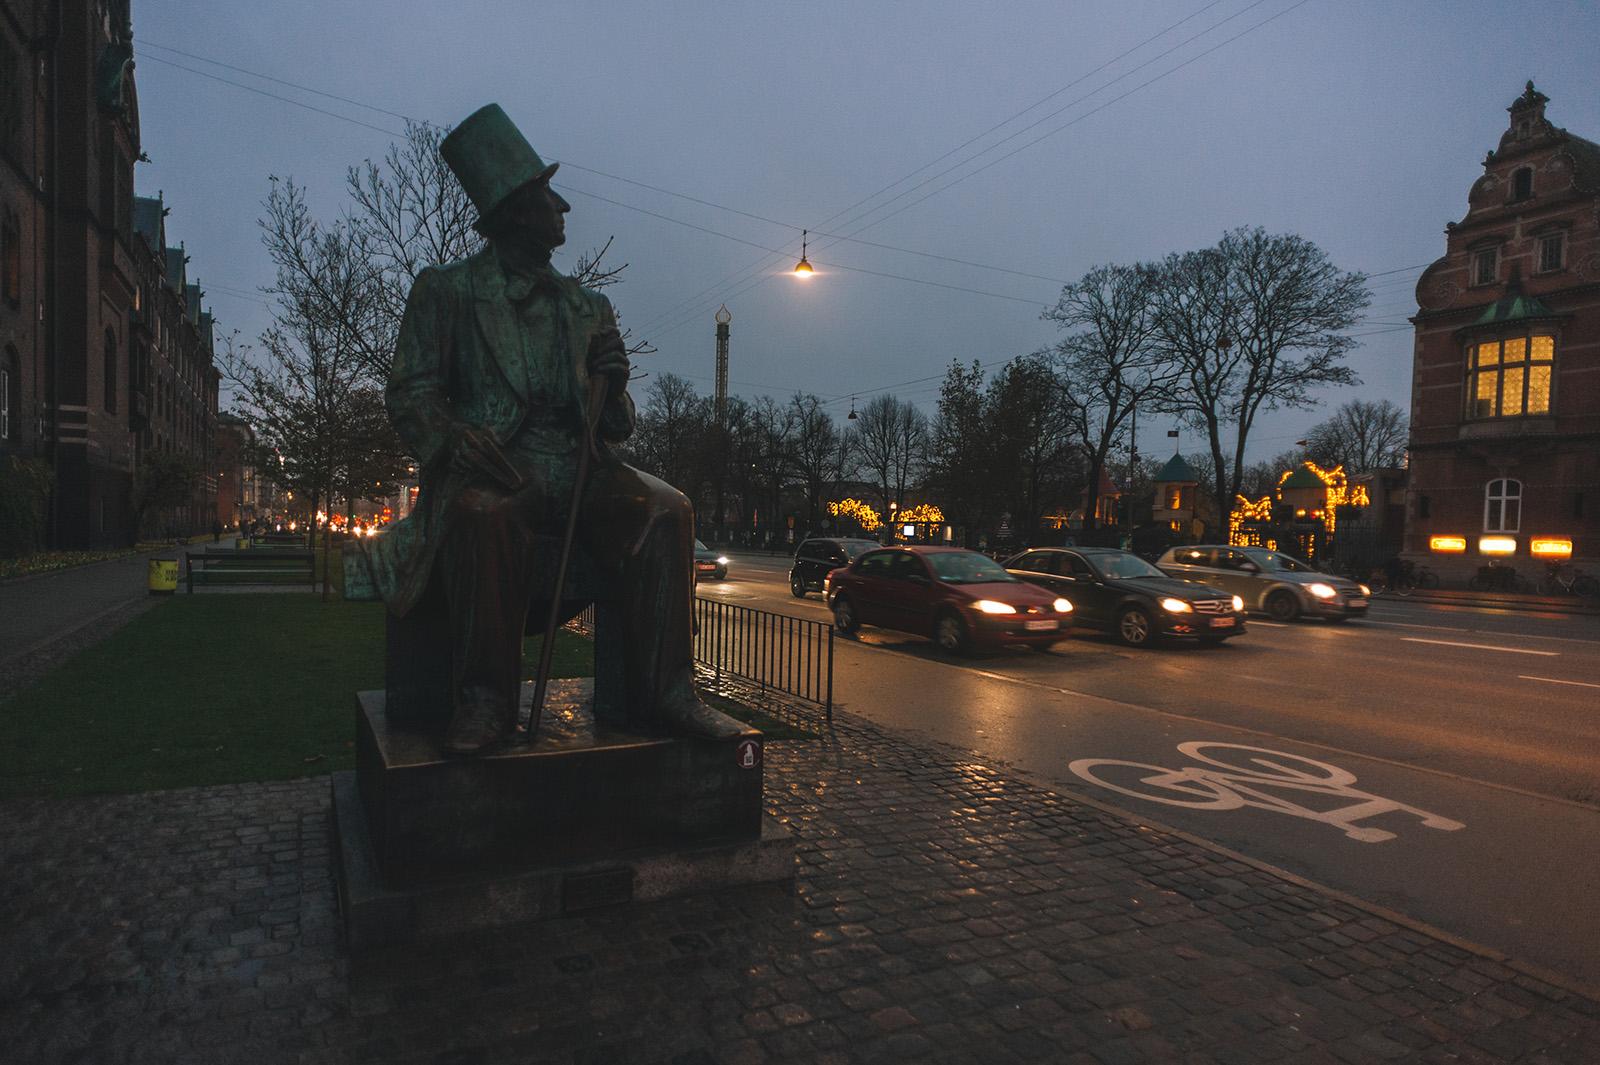 Ганс Кристиан Андерсен